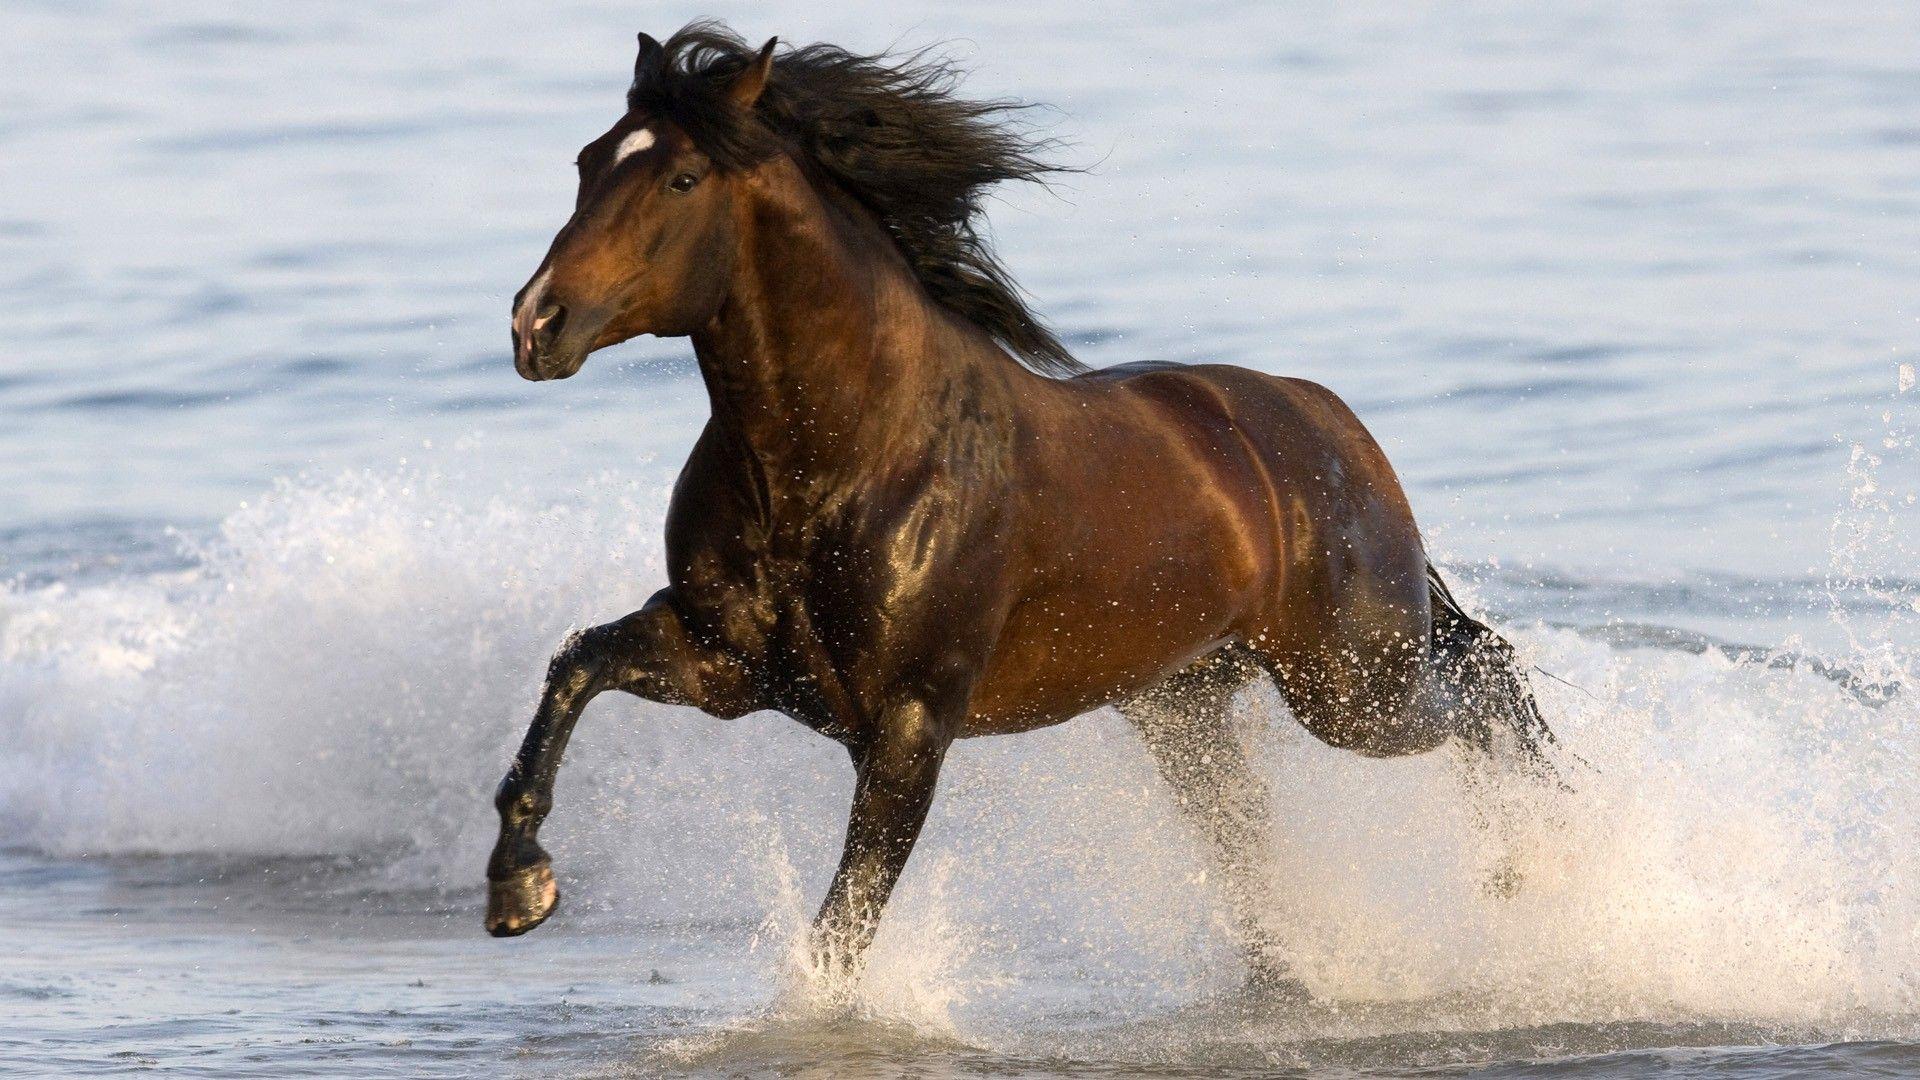 Beautiful Wallpaper Horse Desktop Background - 3c0384bd00e2e380a1f7f93829a43541  You Should Have_485685.jpg